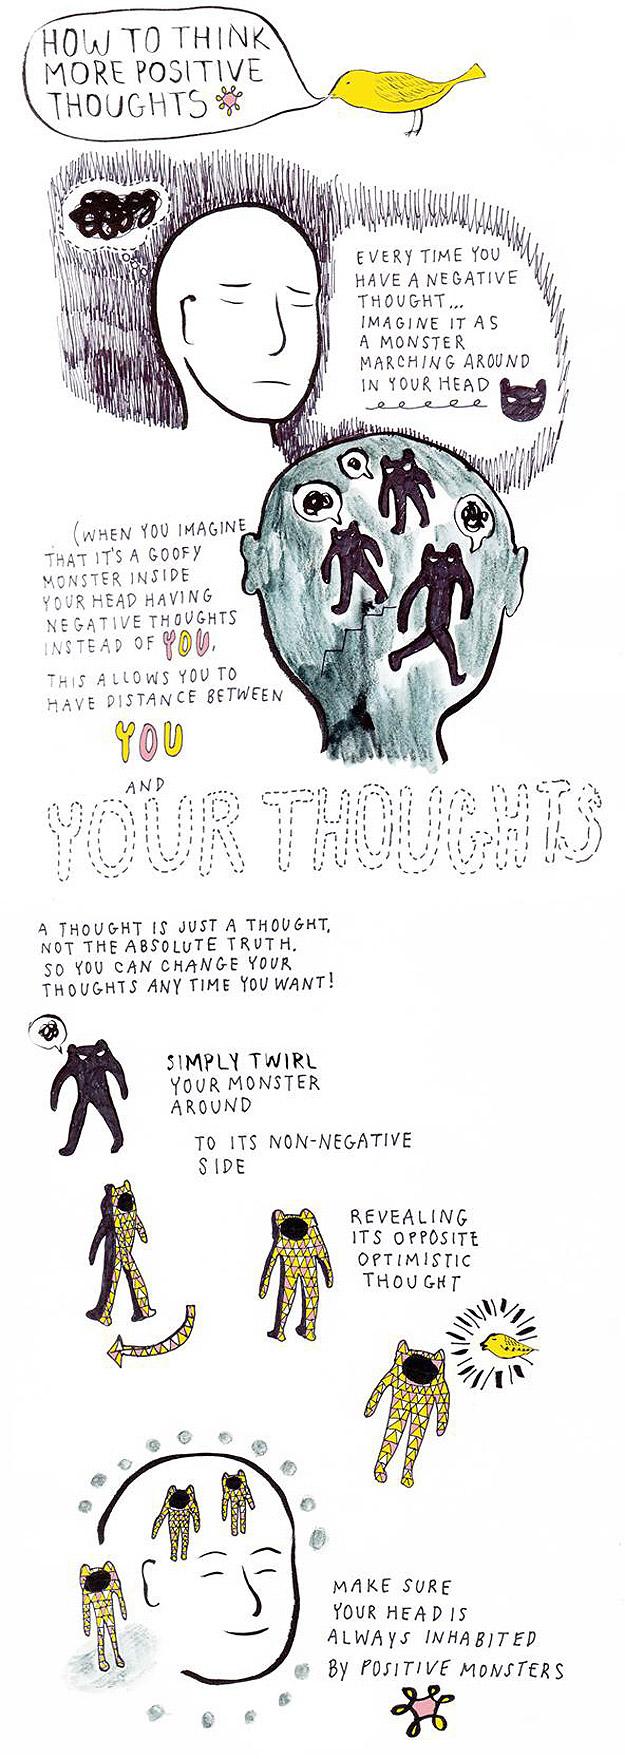 Como ter Pensamentos Mais Positivos [Infográfico]